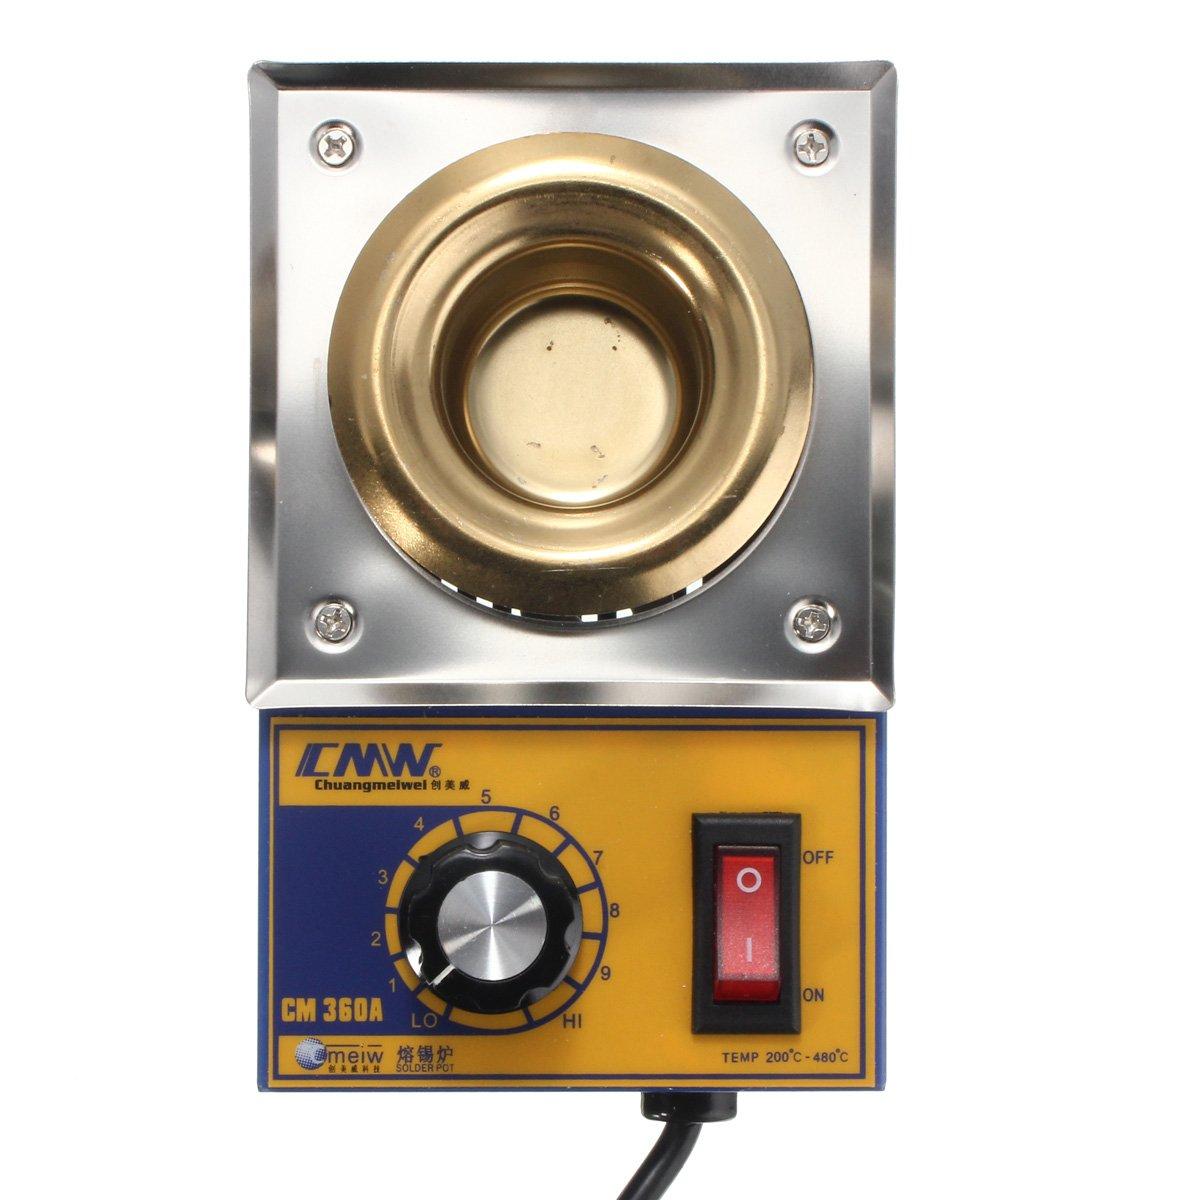 OlogyMart CM360A 100W 200-480 Degree Solder Pot Soldering Desoldering Stainless Steel Plate